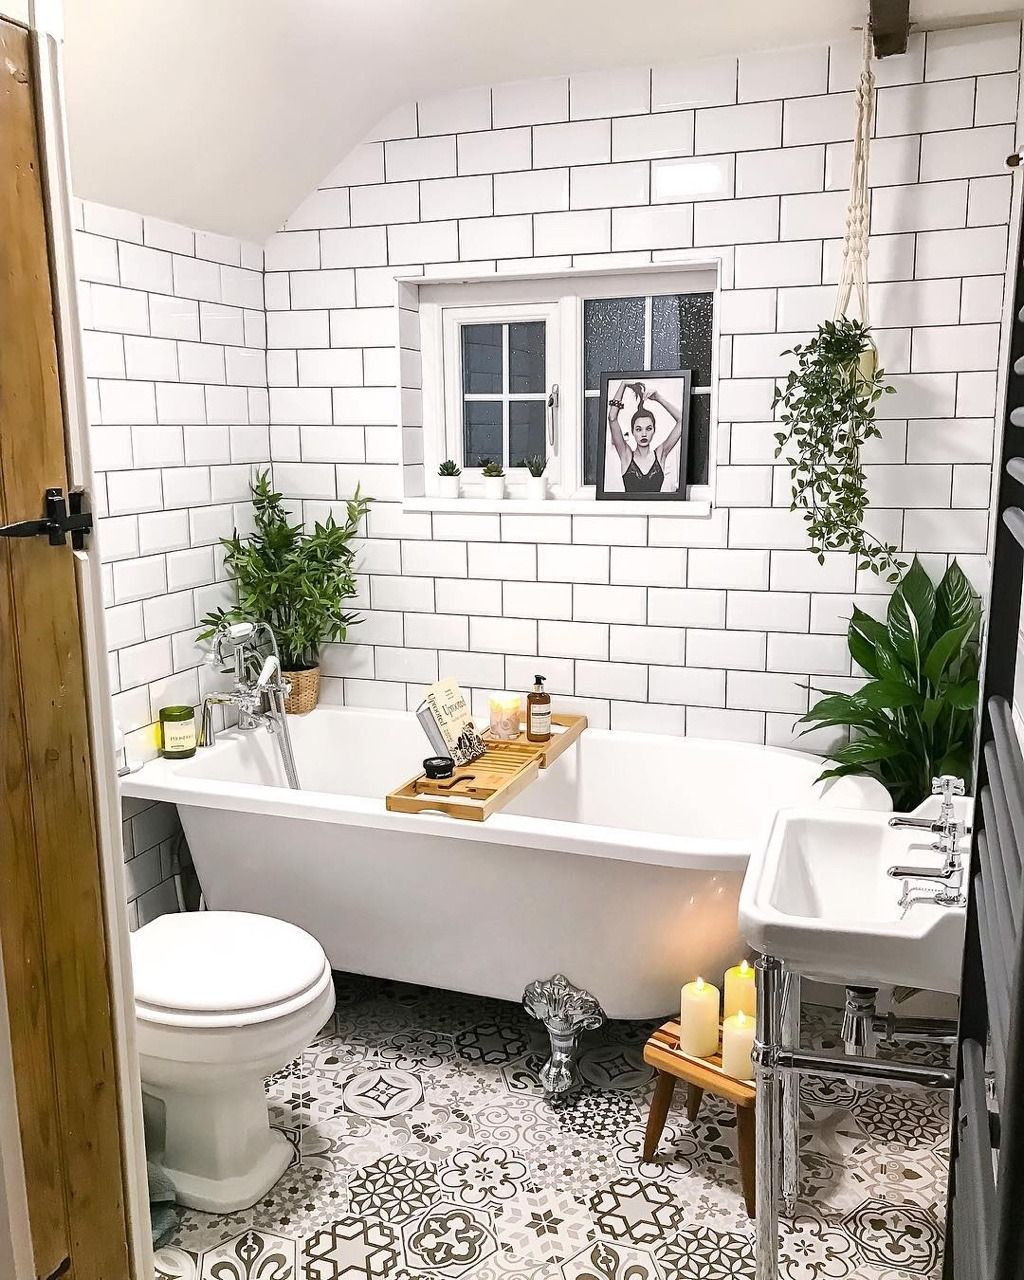 5 Gorgeous Scandinavian Bathroom Ideas: Bathroom Inspiration // Golden Fox Cottage The Perfect